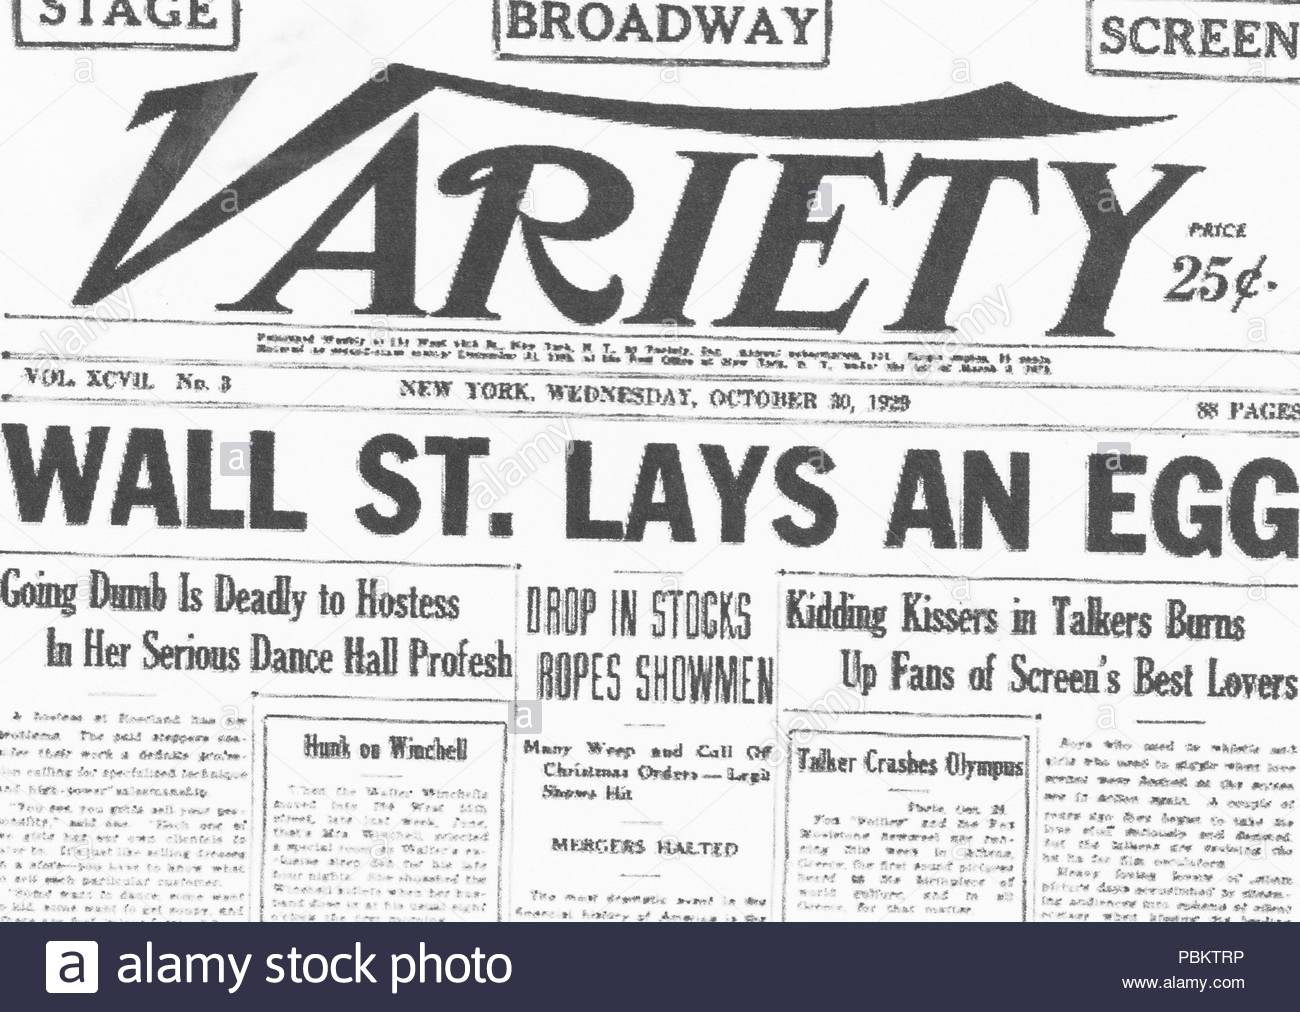 Stock Market Crash Of 1929 Stock Photos & Stock Market ...